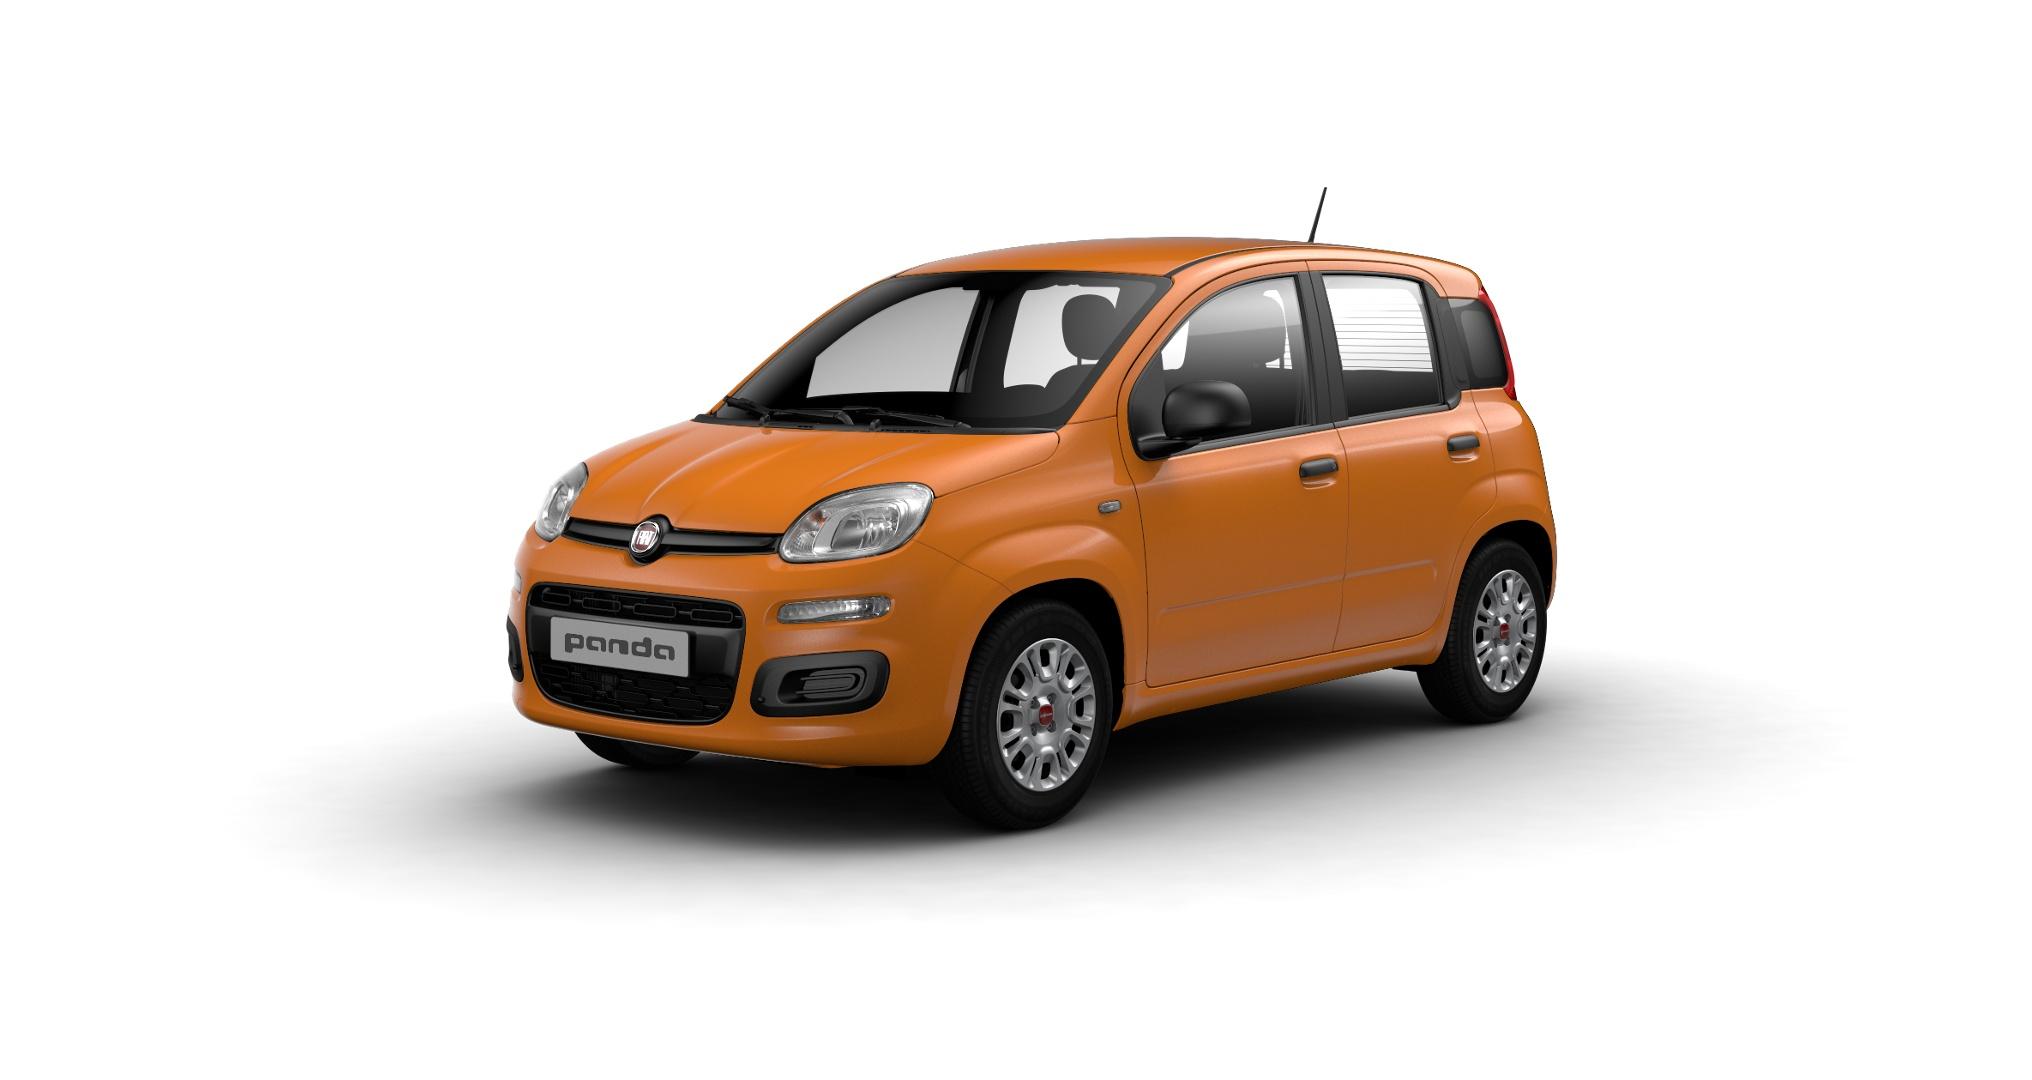 getImage?source=fiat&model=3194 wccf&market=1000&brand=00&drive=1&engine=84&fuel=38&gear=43&body=516&resolution=BIG&coding=PP&skipReconcile=true&mmvs=0031912D4000&opt=516,123,0R4,025,5DE,076&seat=123&wheel=0R4&pack=&angle=1&view=EXT&consumer=large&width=2032&height=1080&background=FFFFFF Offerta Fiat Panda MY21